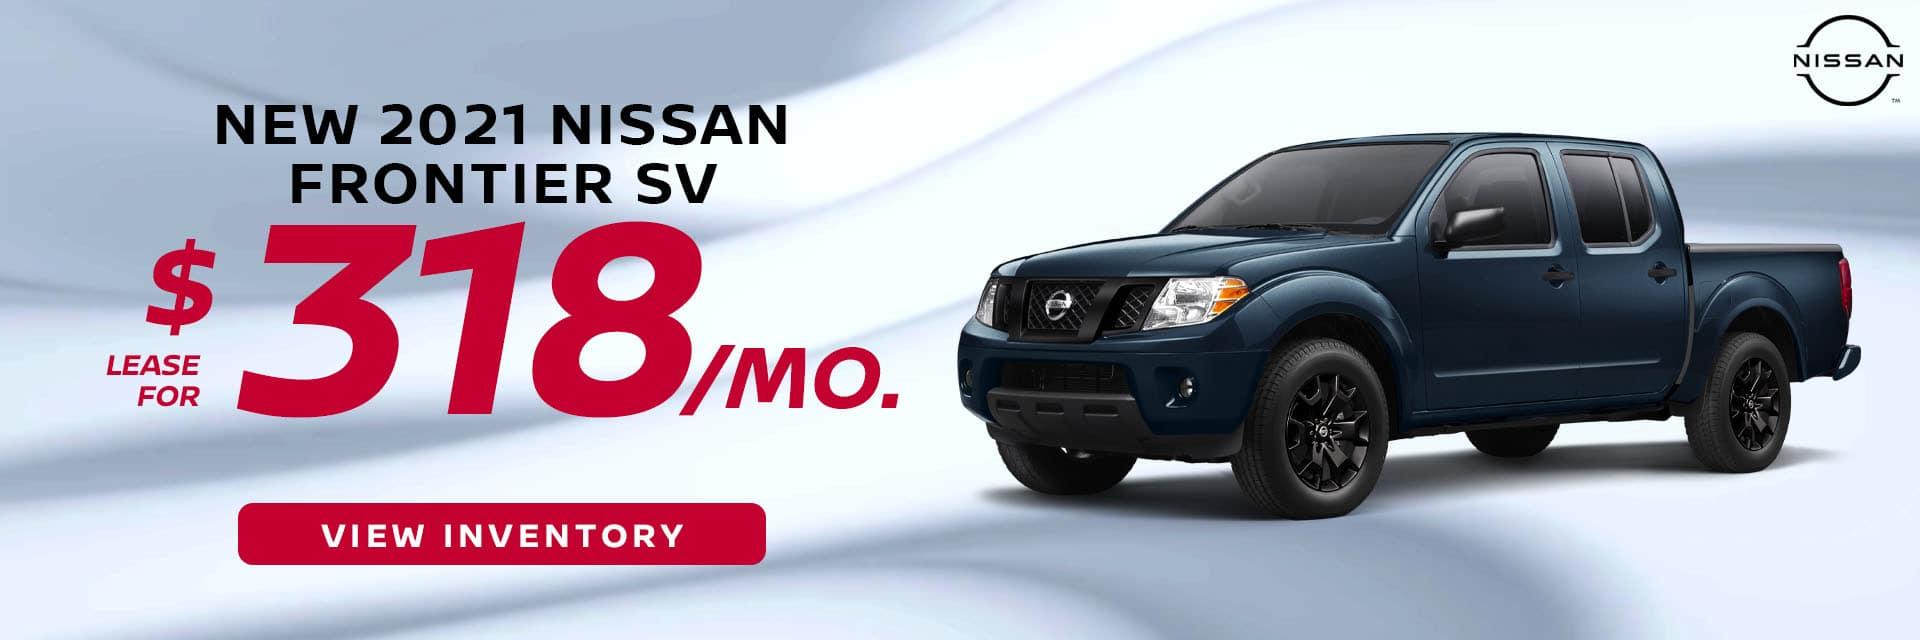 CNSN-September 2021-2021 Nissan Frontier copy